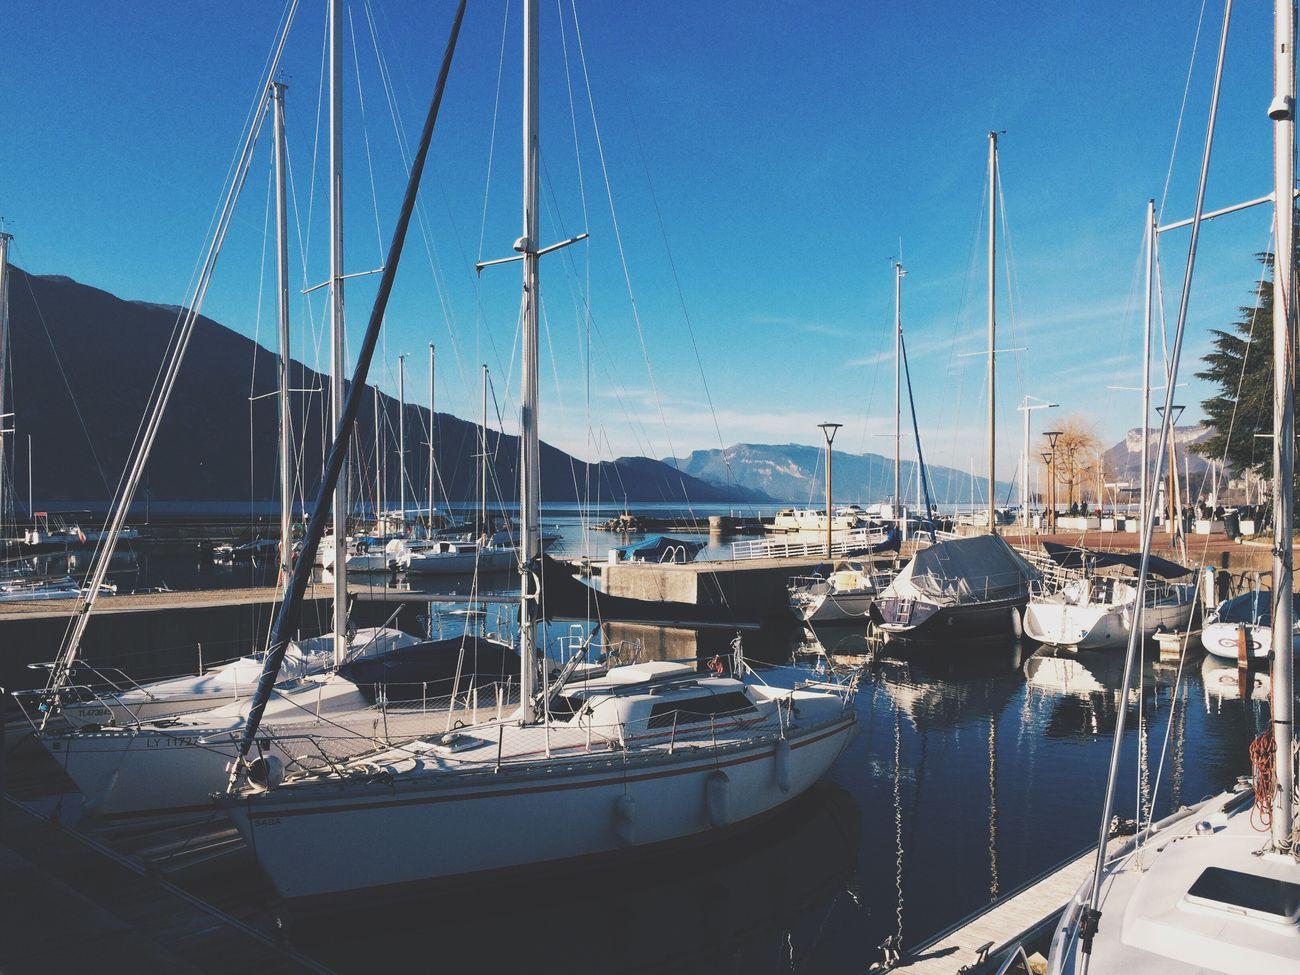 Aix Les Bains Lake Boat Sunny Day